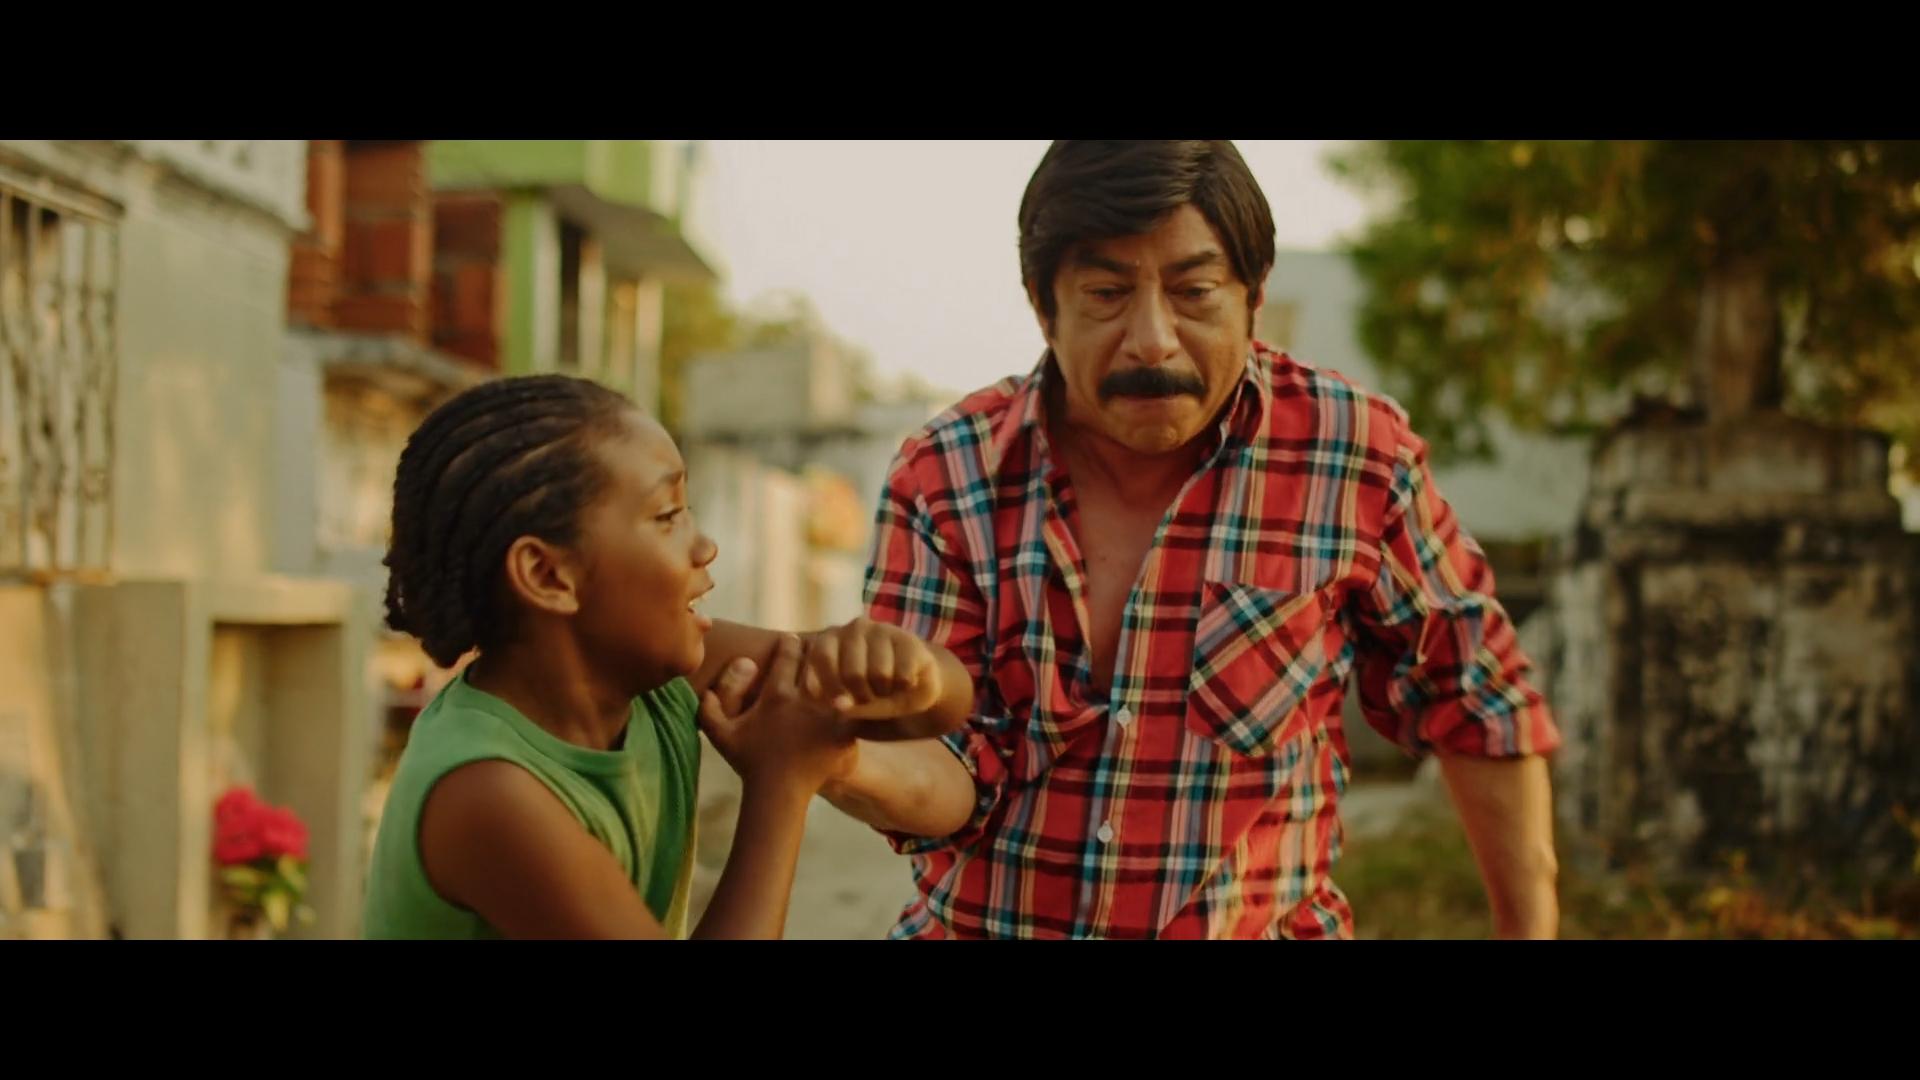 Jaime Correa - HARMONIE - Vesely Films